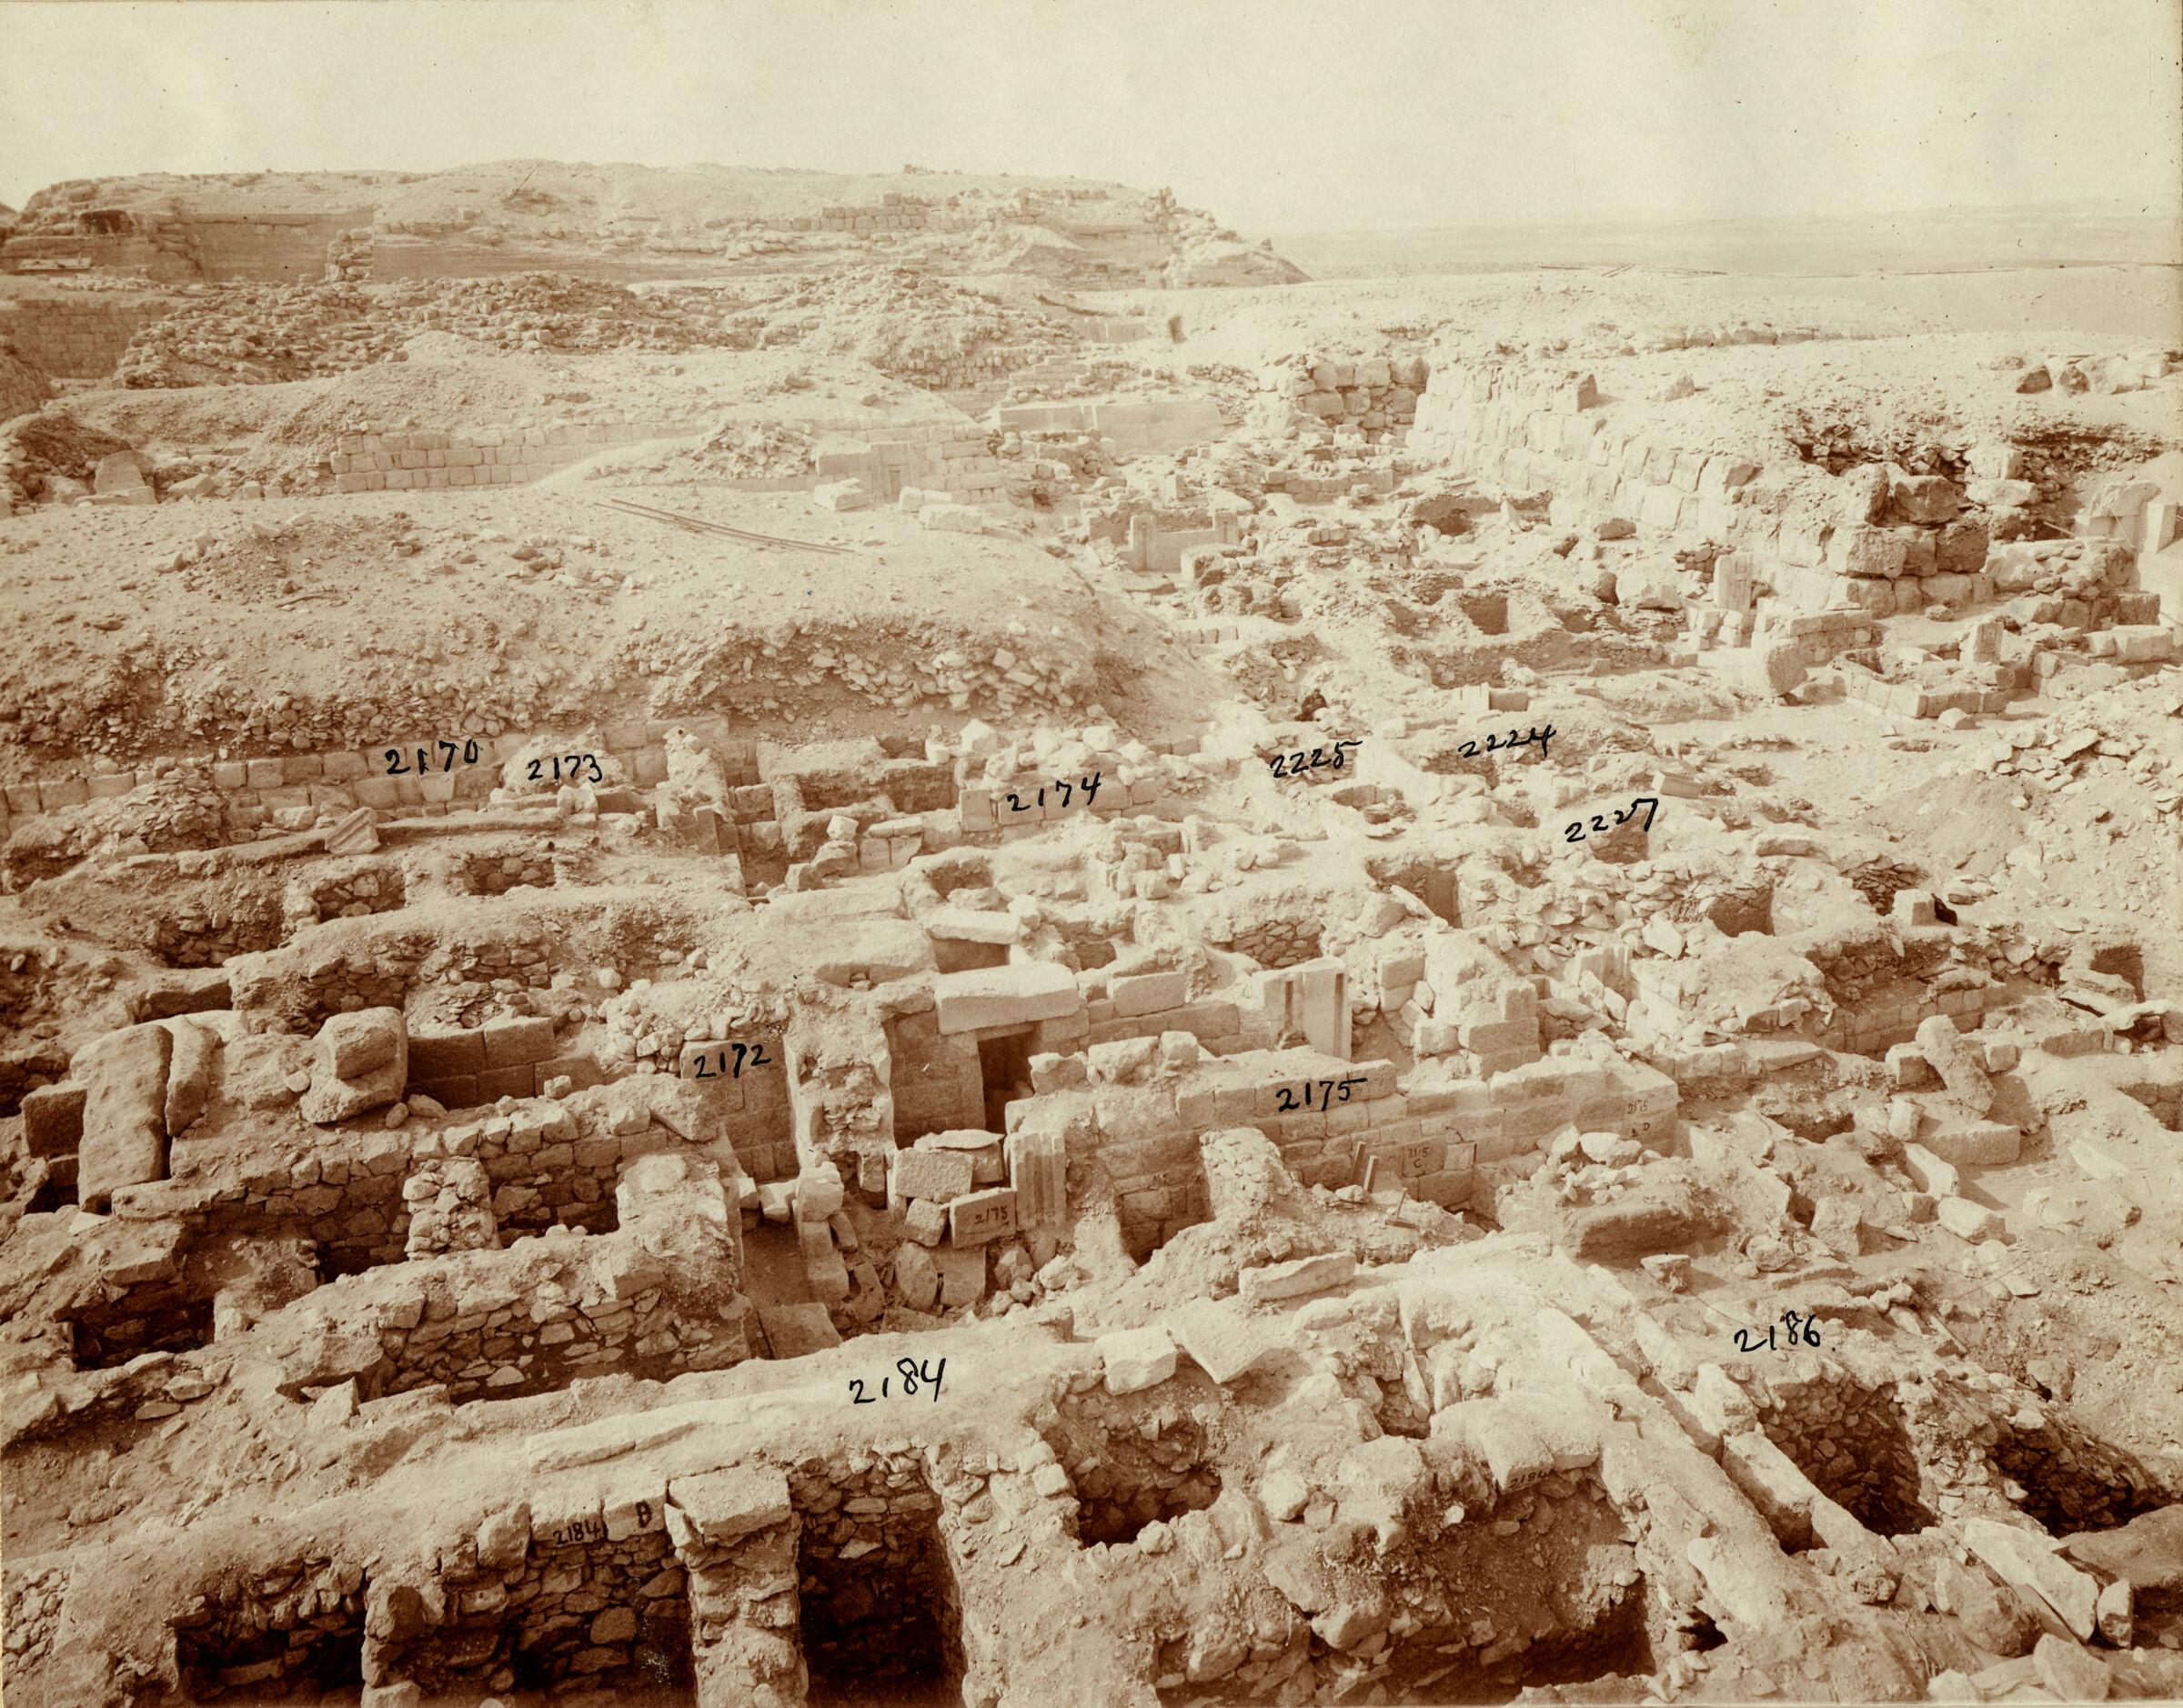 Western Cemetery: Site: Giza; View: G 2170, G 2184, G 2186, G 2172, G 2175, G 2177, G 2174, G 2173, G 2225, G 2224